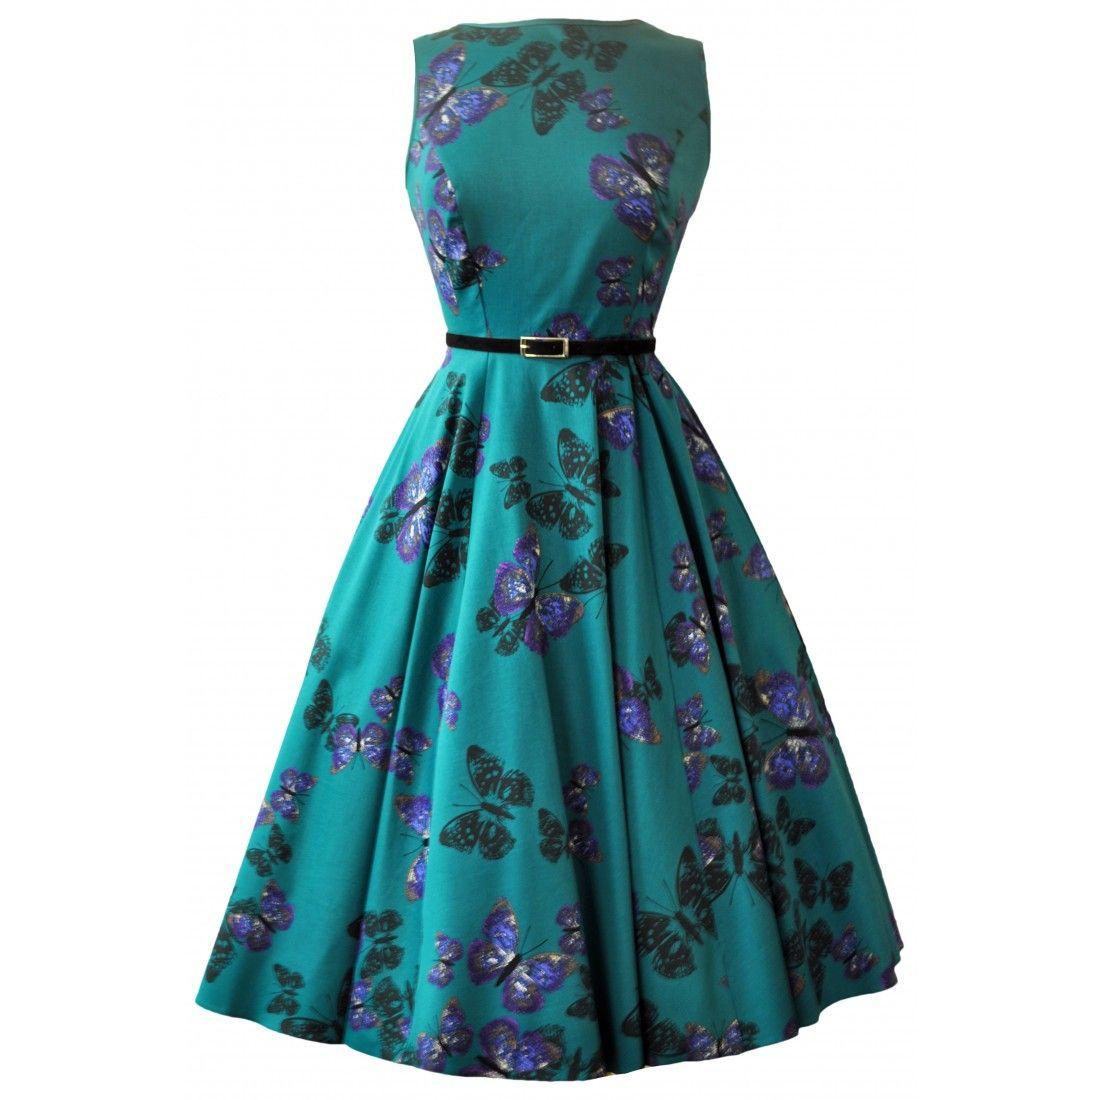 Lady V London Teal Green Butterfly Hepburn Dress